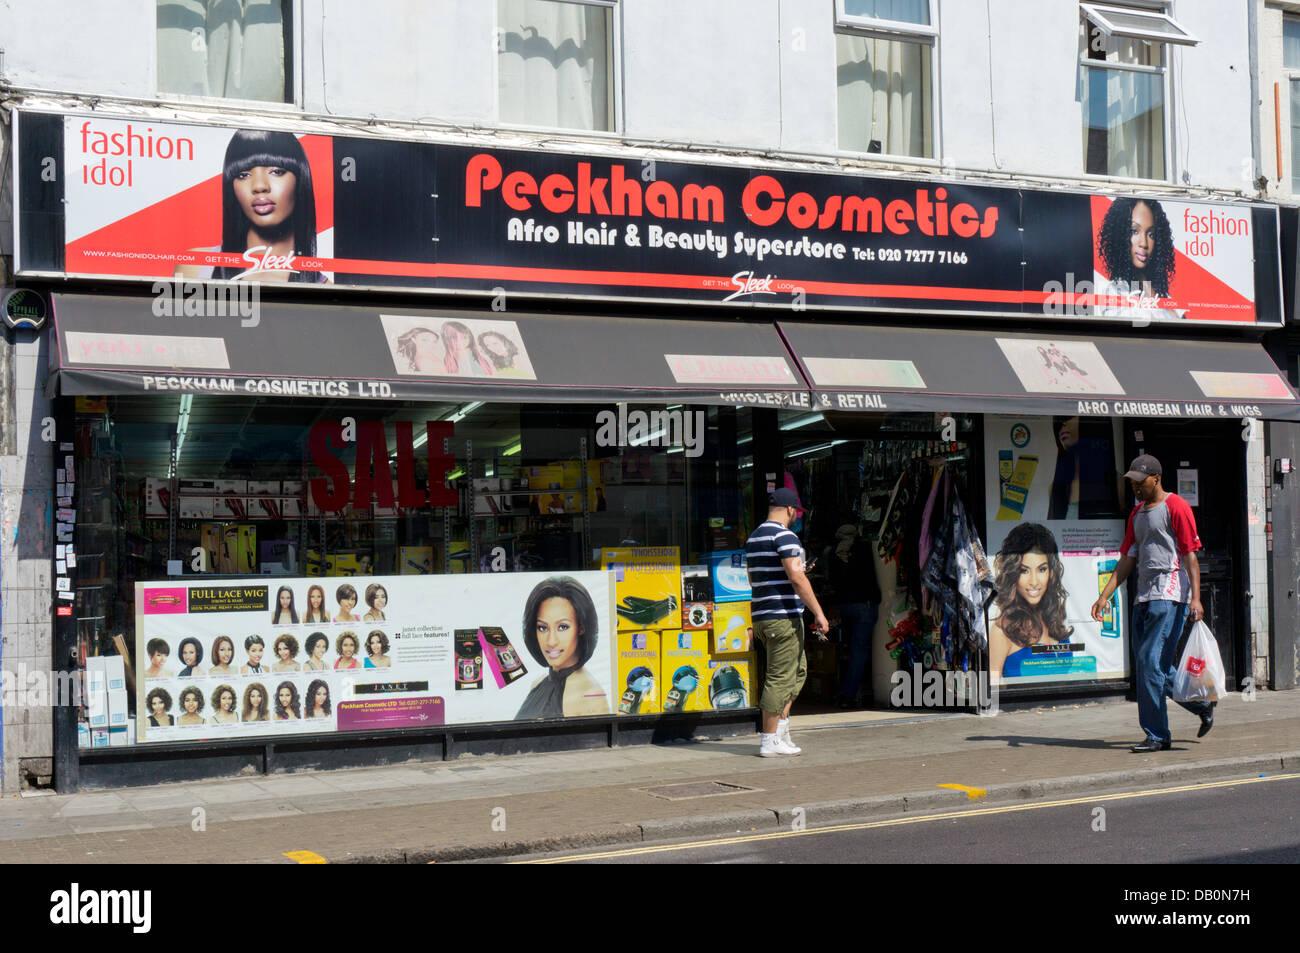 Peckham Kosmetik Afro-Haar & Schönheit Superstore in Roggen Lane, Peckham, Südlondon. Stockbild